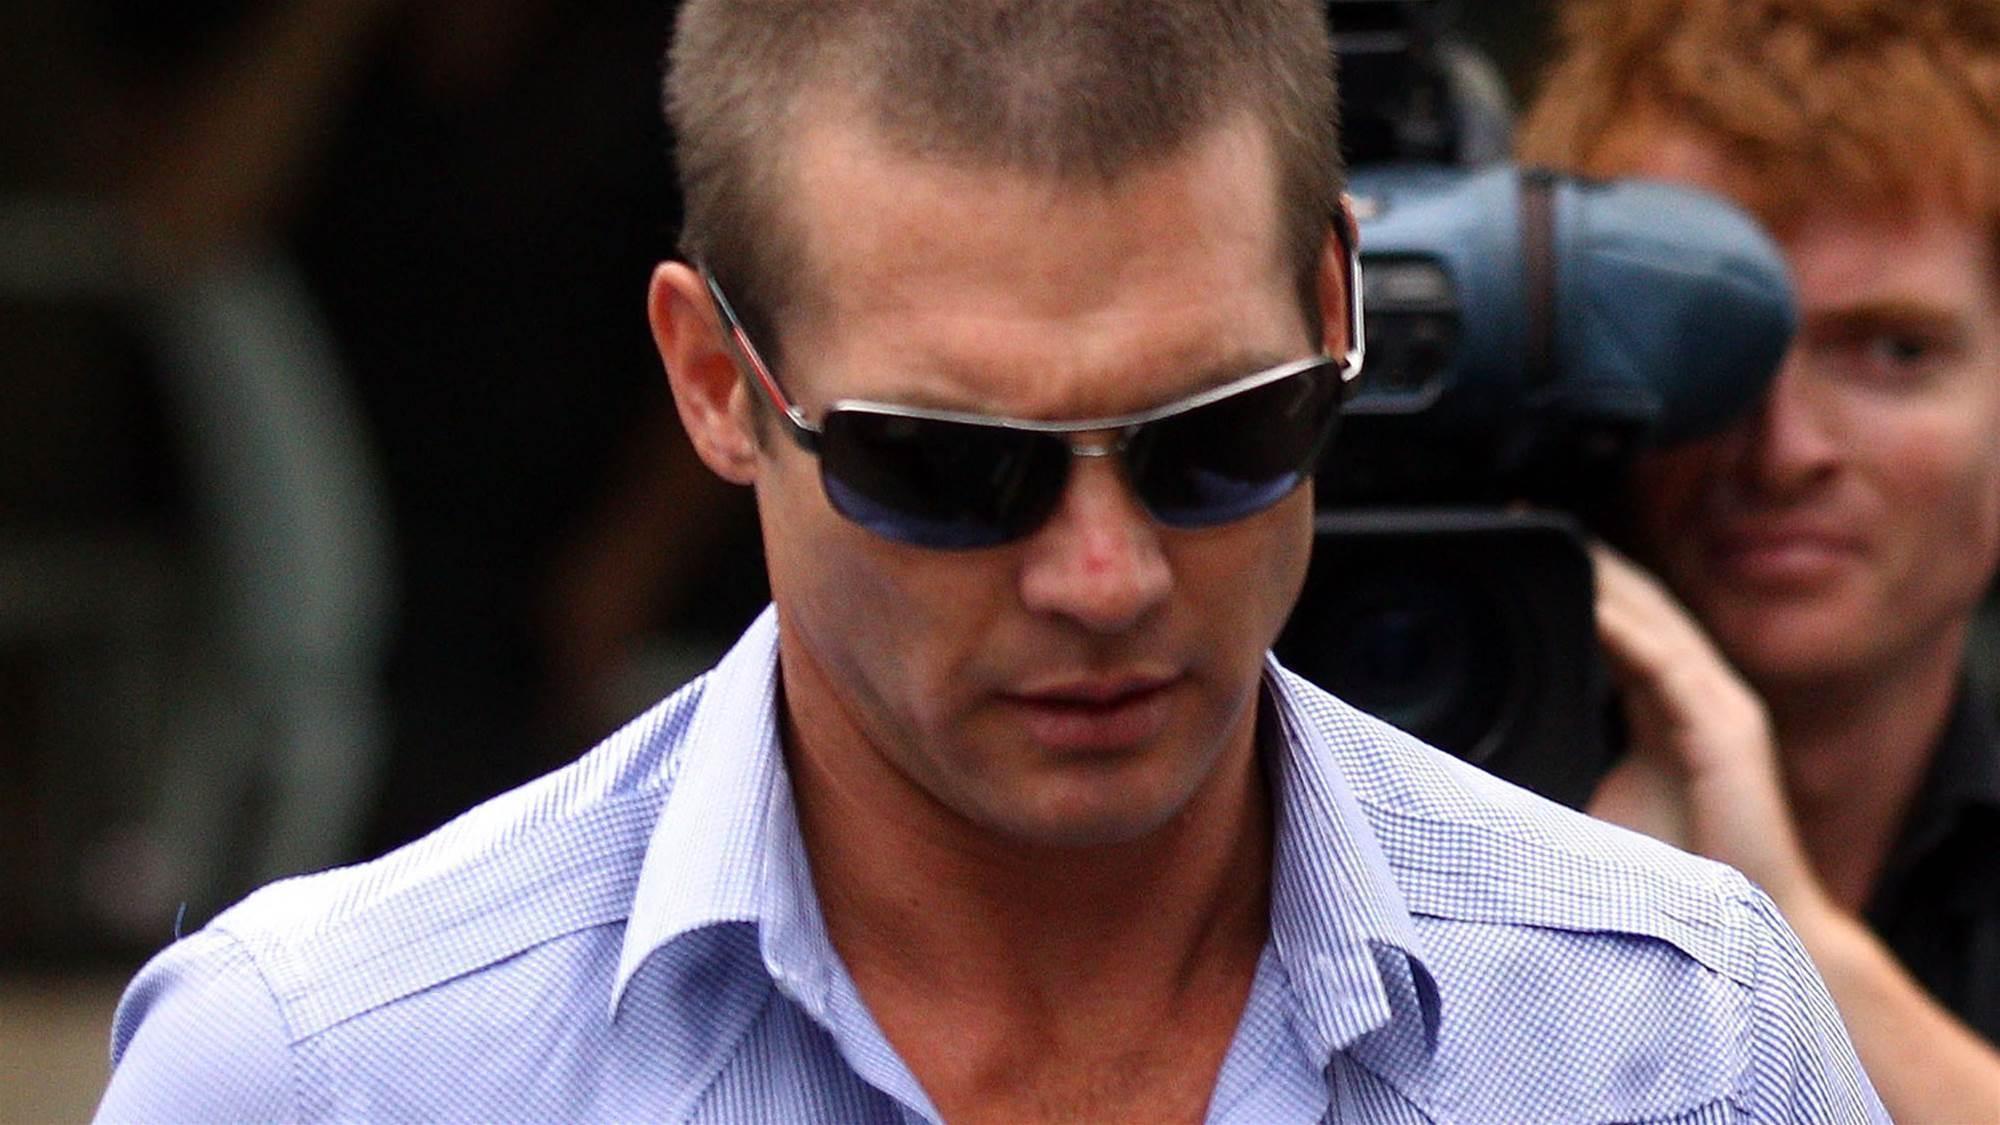 Ben Cousins assaulted in Prison